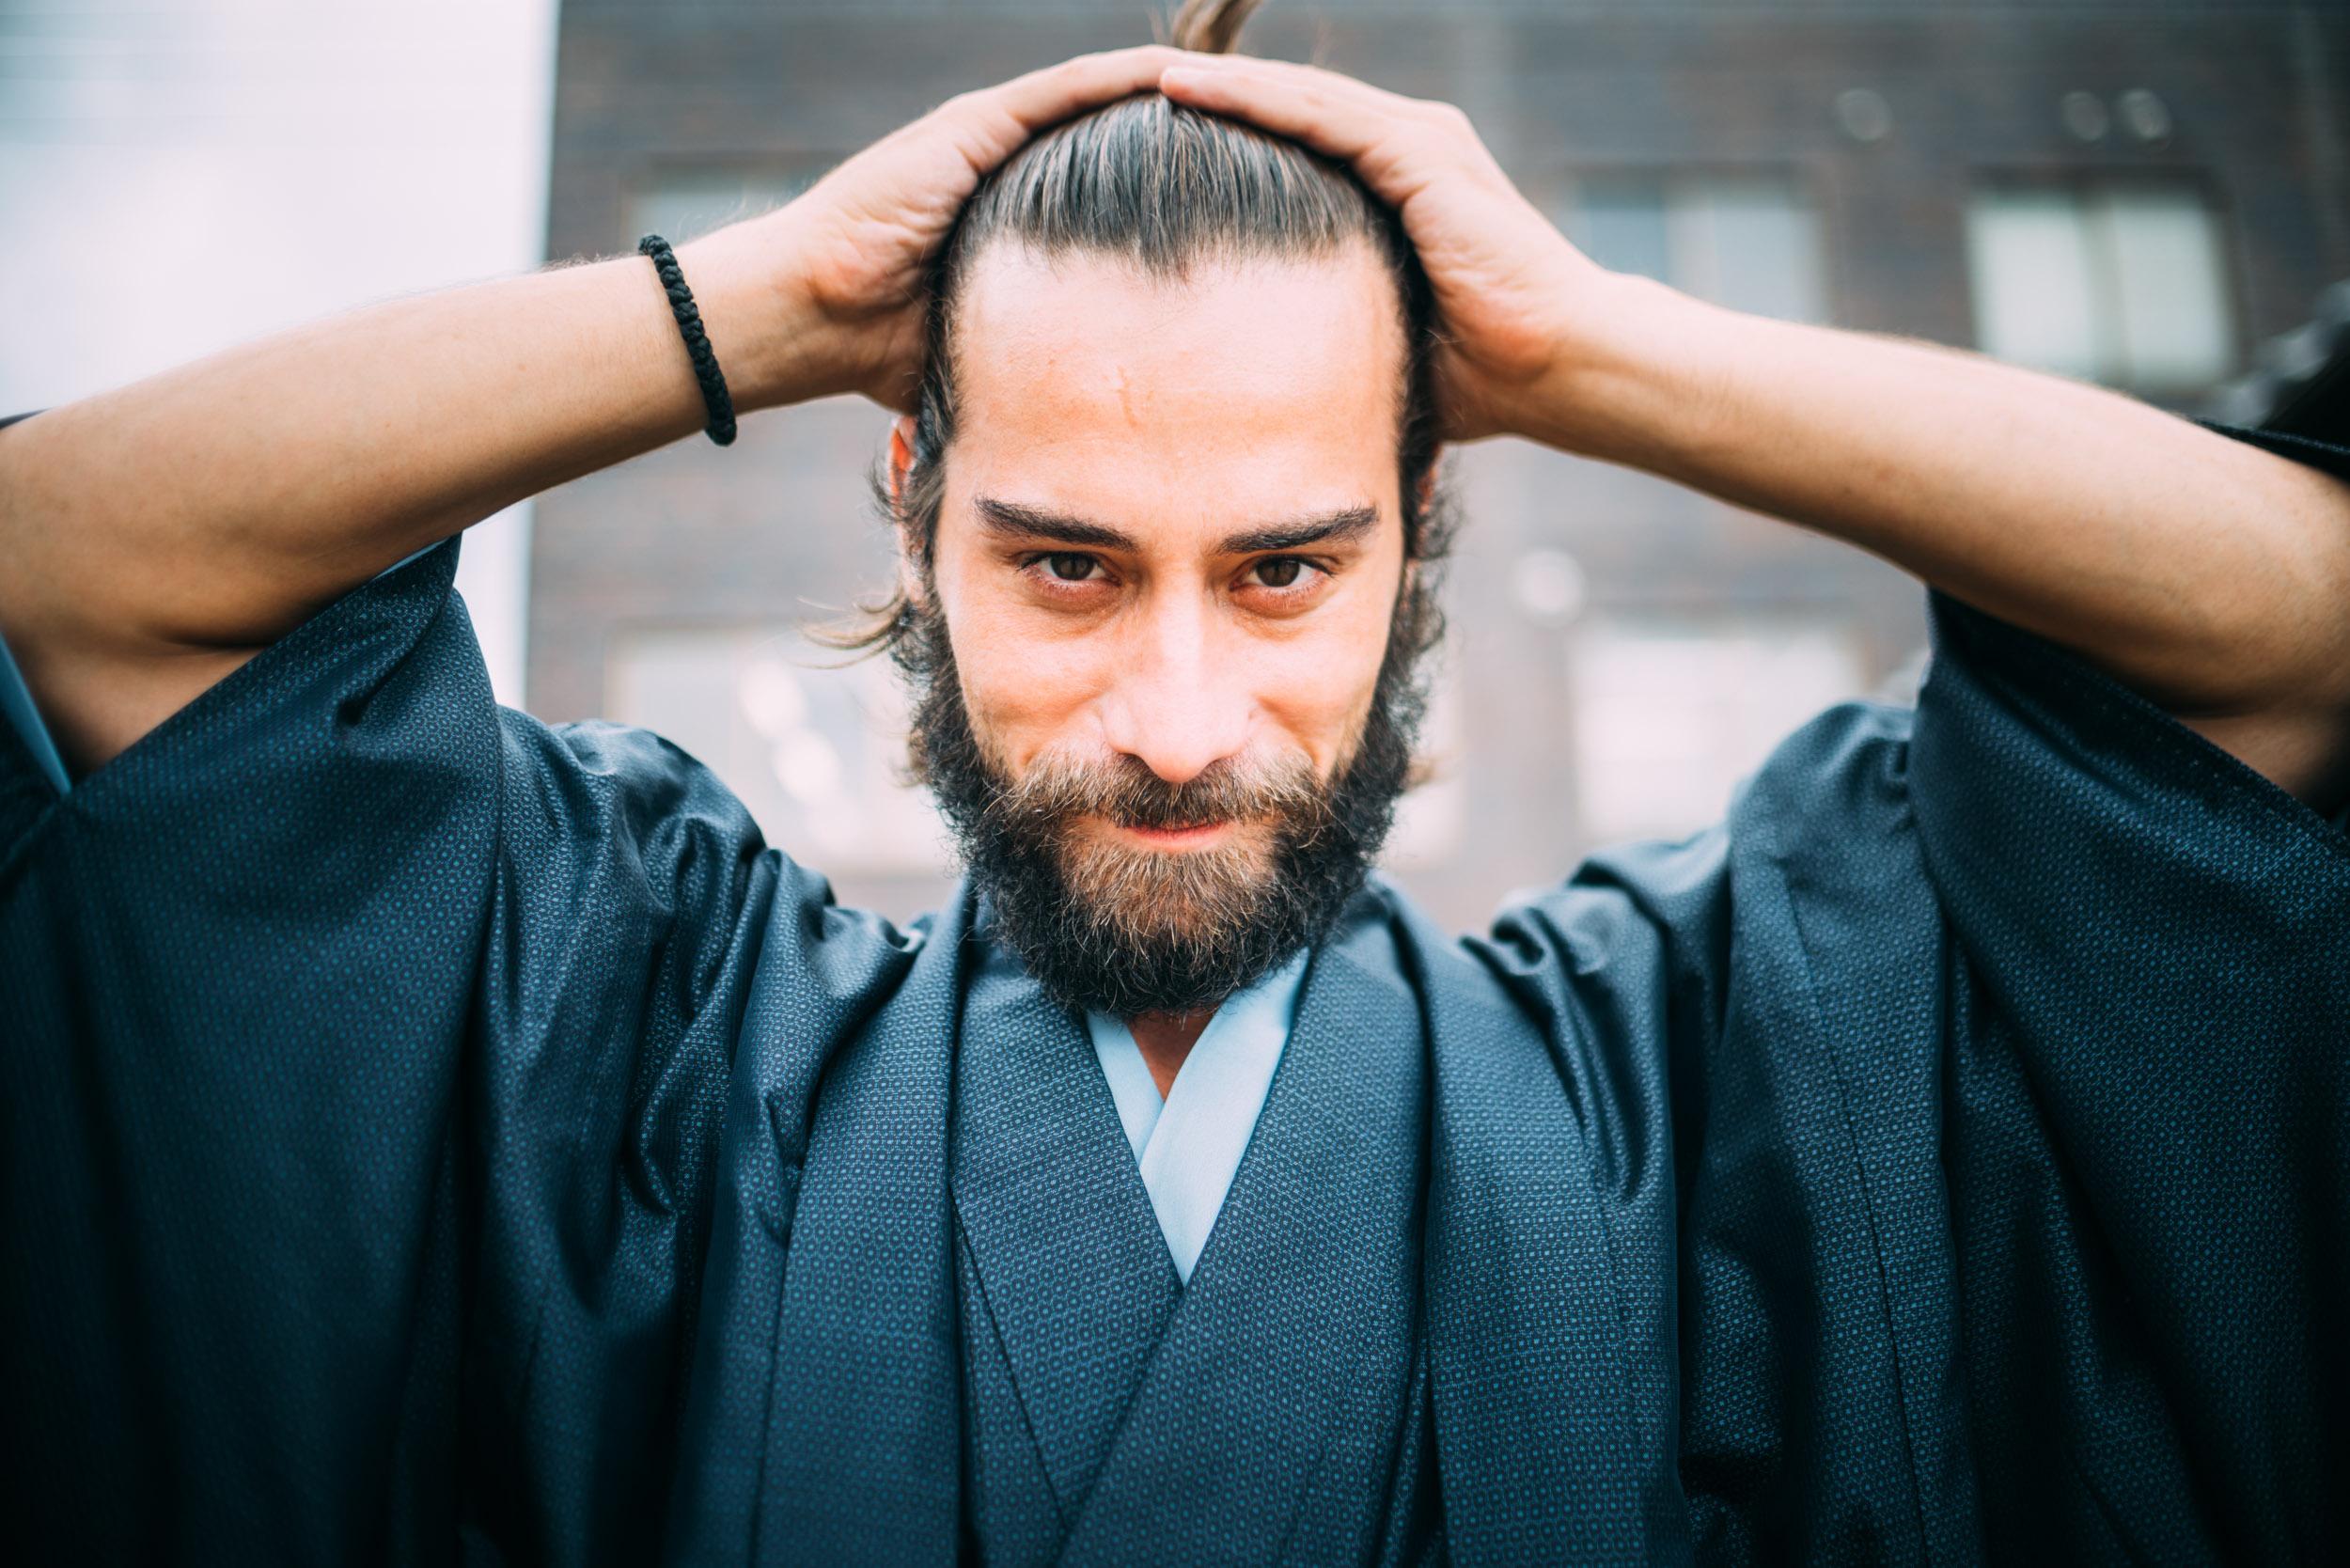 Who's looking like a samurai 😉